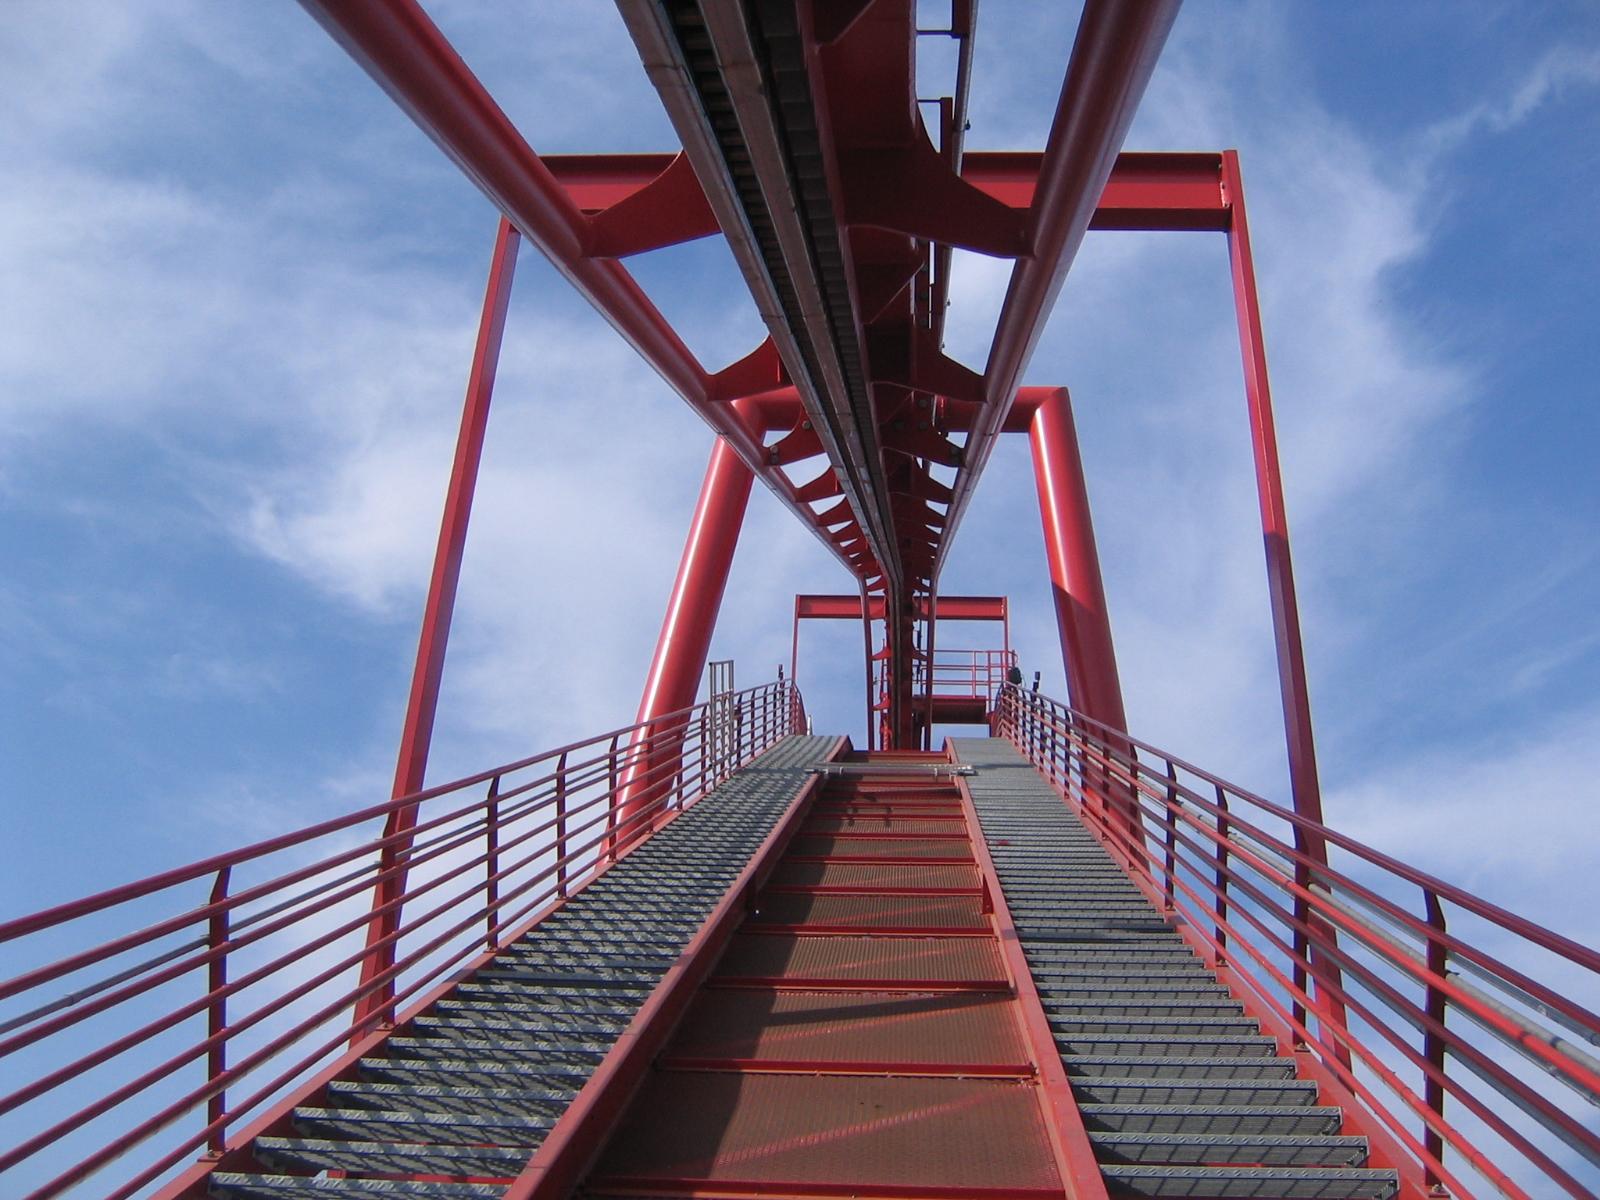 roller-coaster-ride